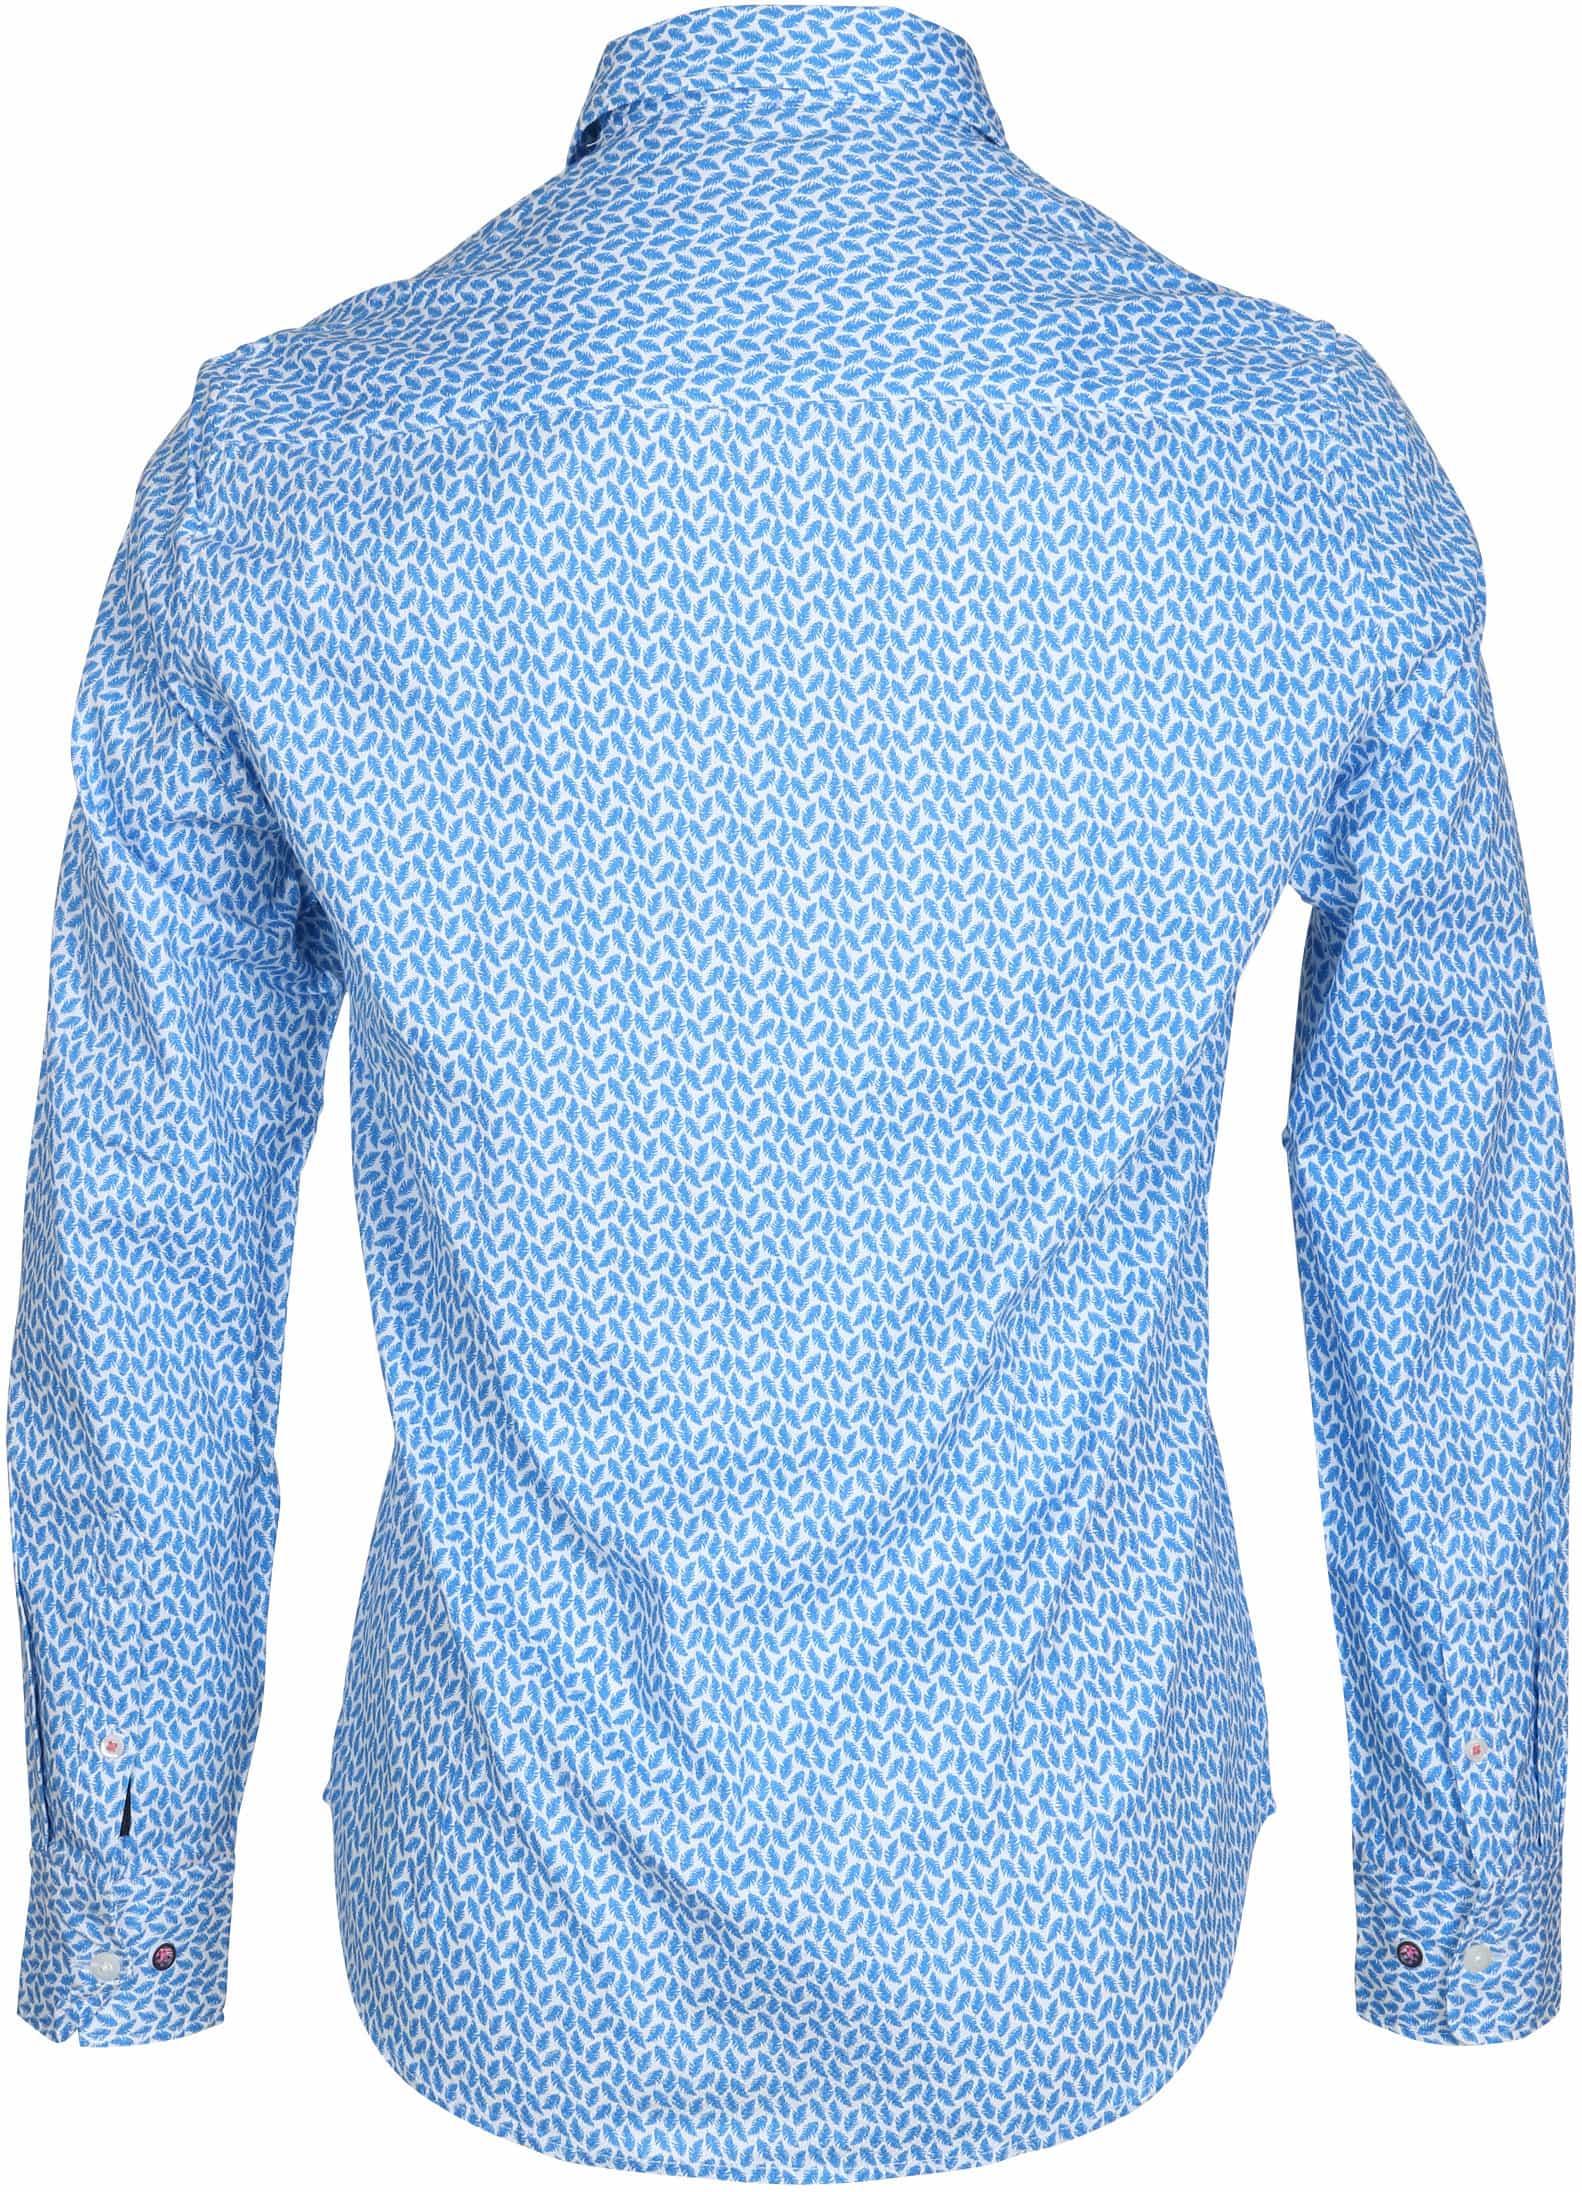 NZA Overhemd Jasper Blauw Print foto 2